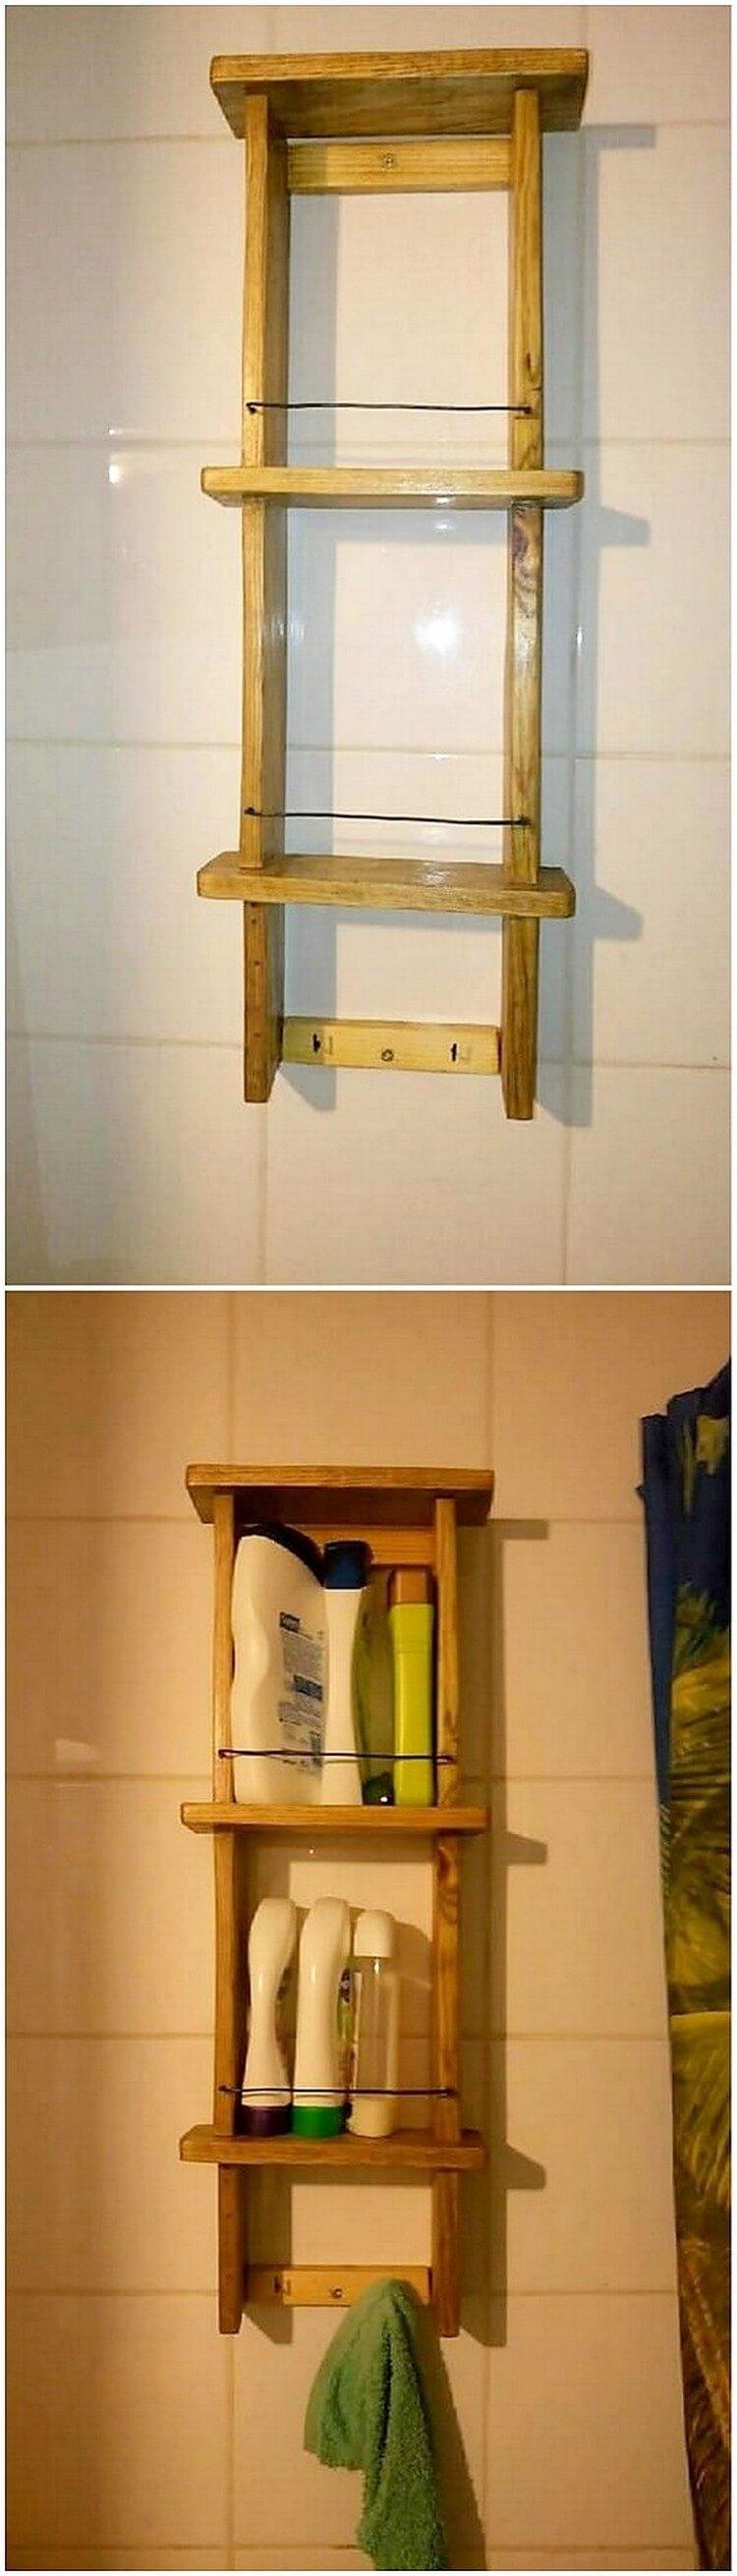 Pallet Bathroom Wall Shelf